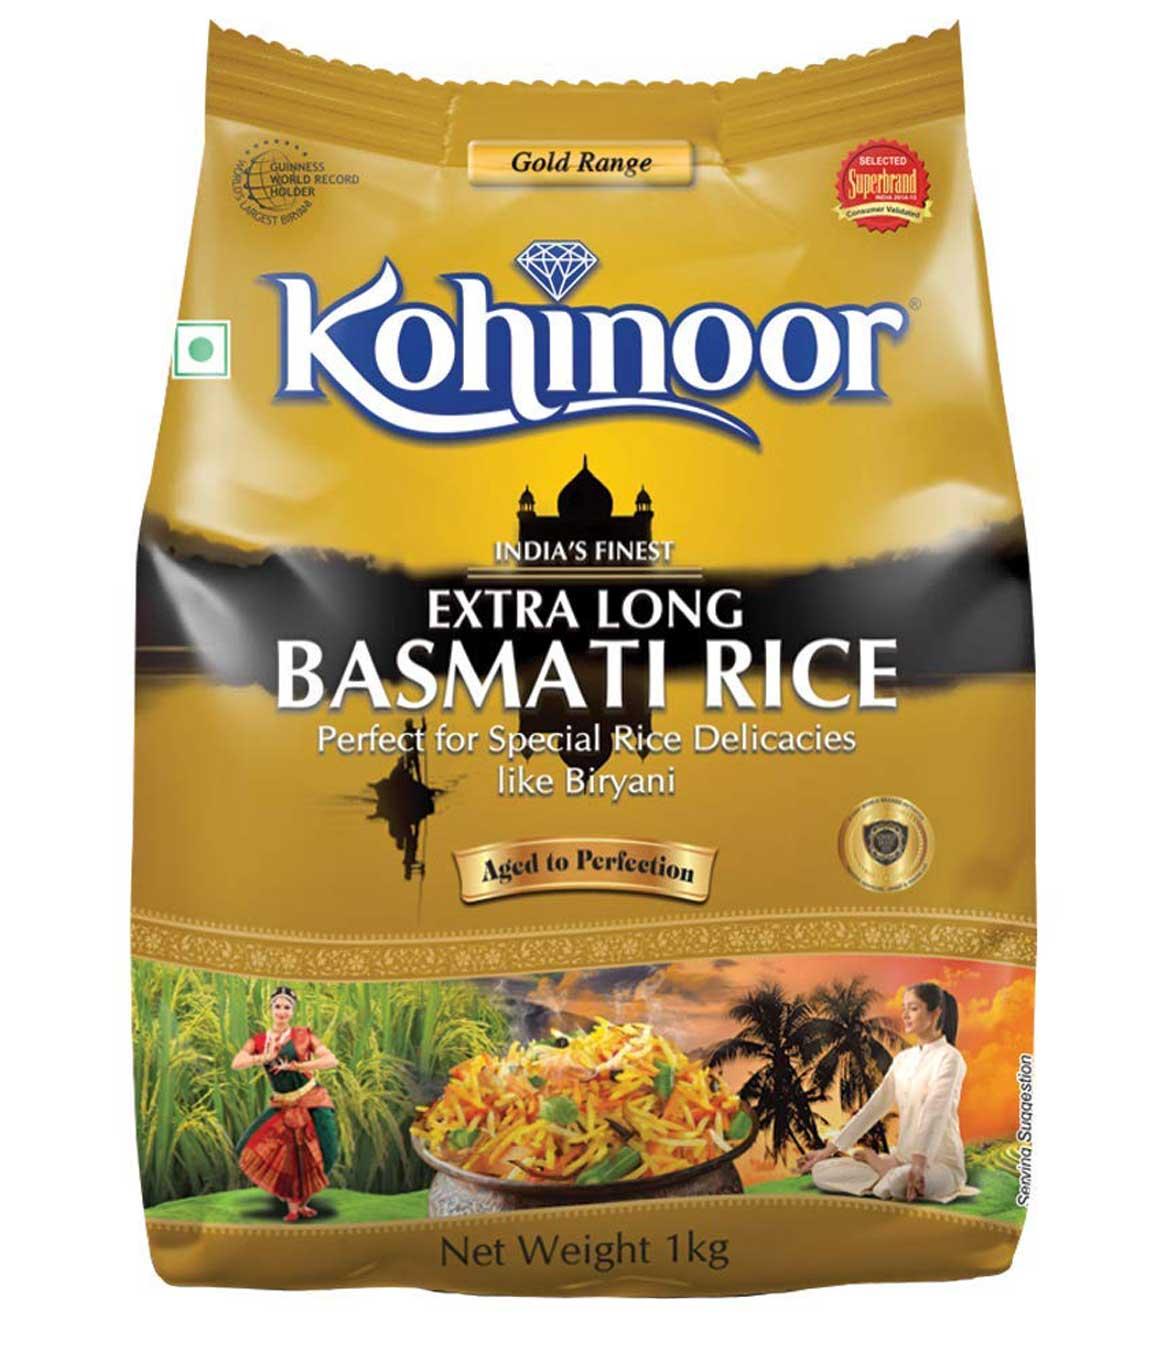 Kohinoor Extra Long Gold Basmati Rice, 1kg